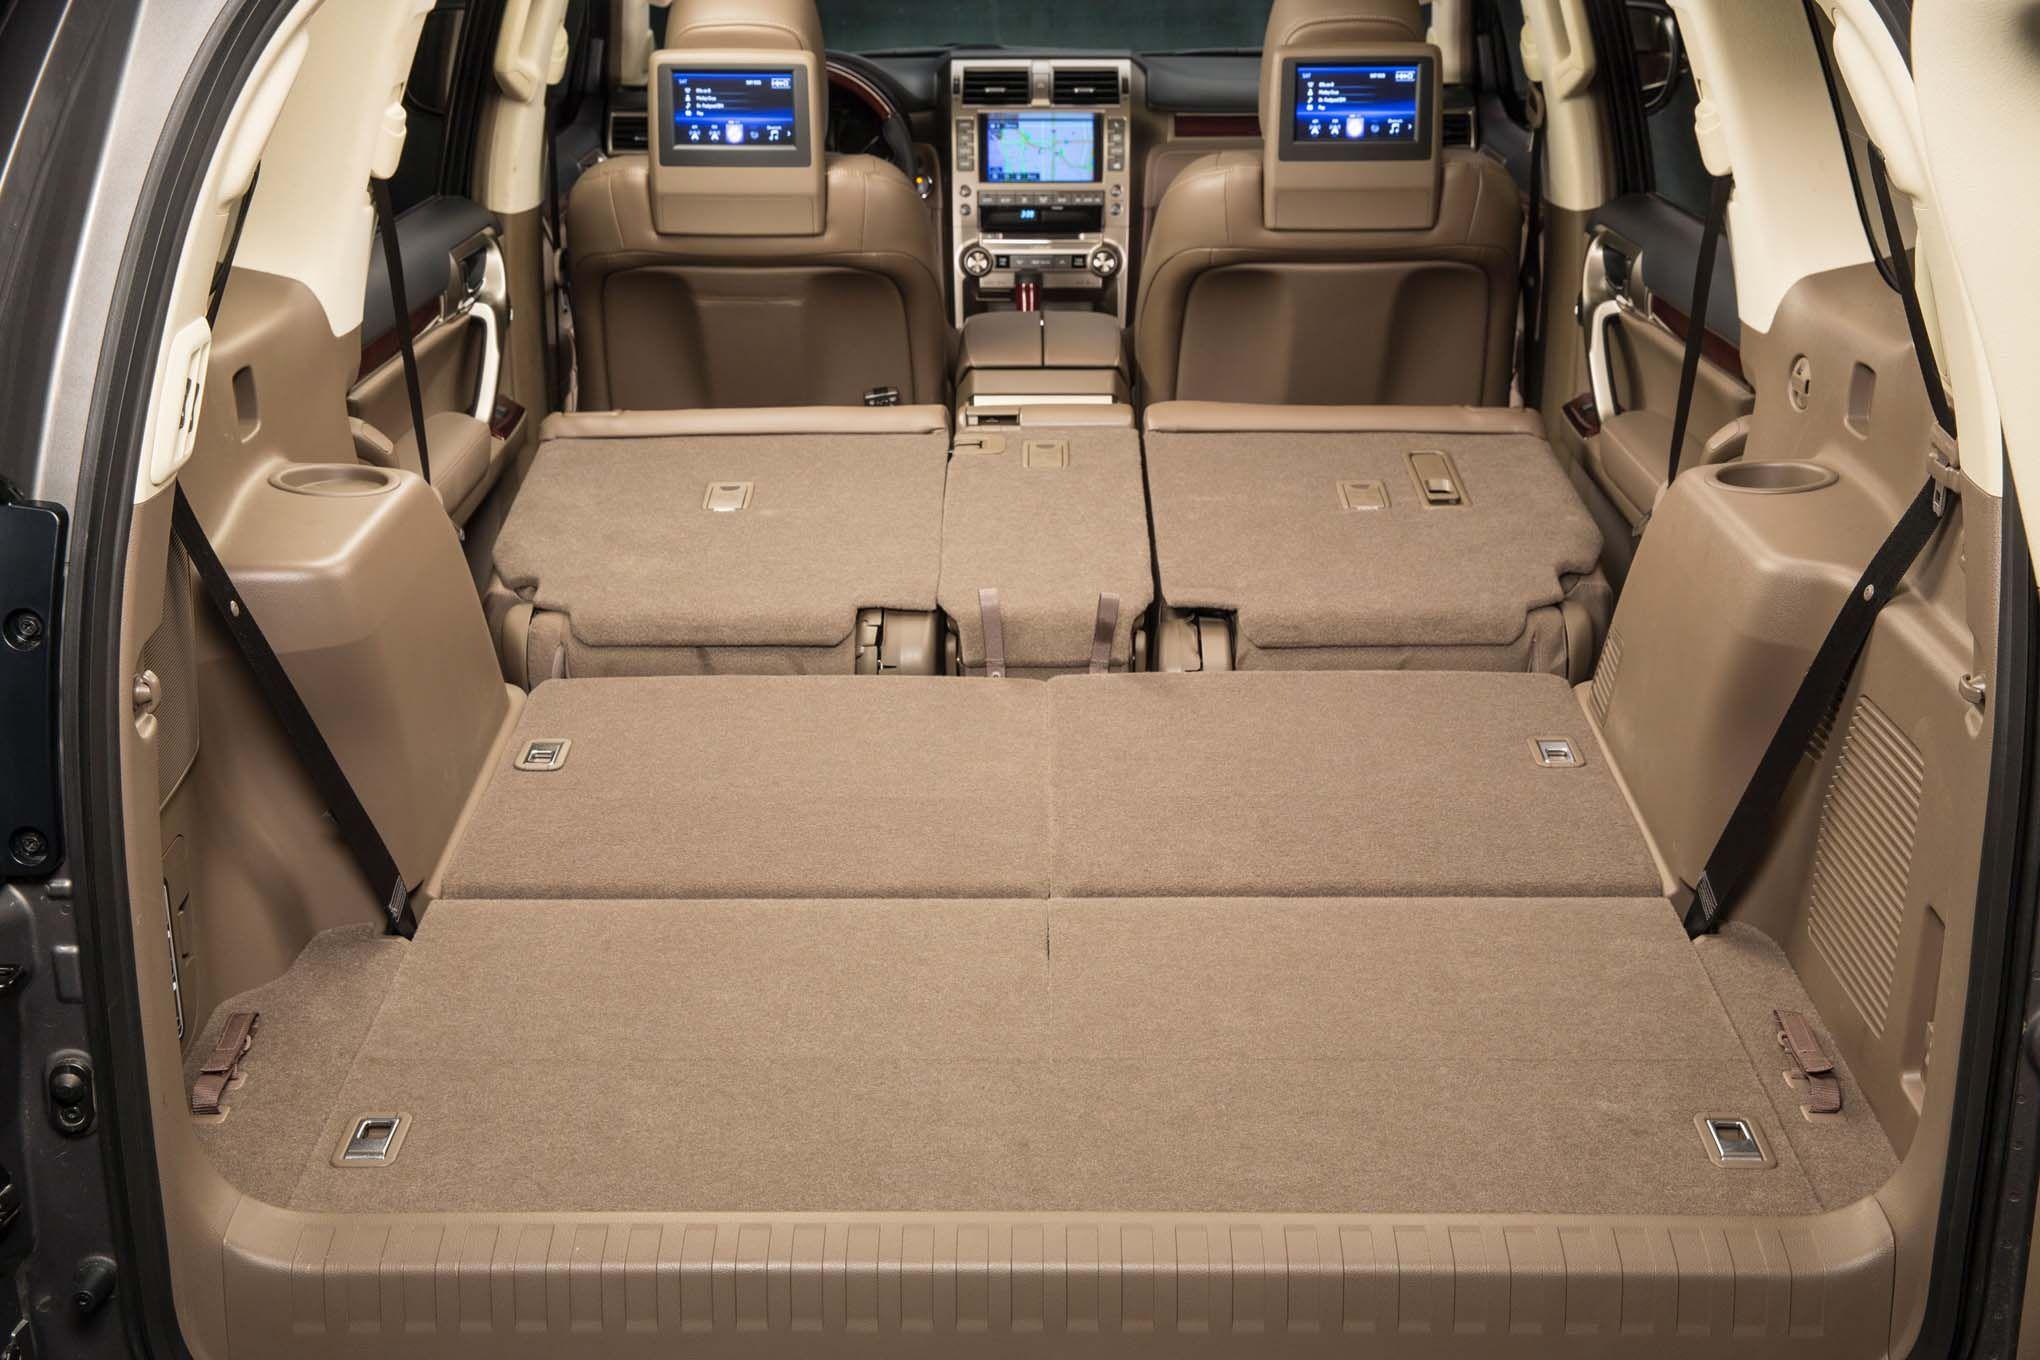 2019 Lexus GX460 Cargo space future cars pictures